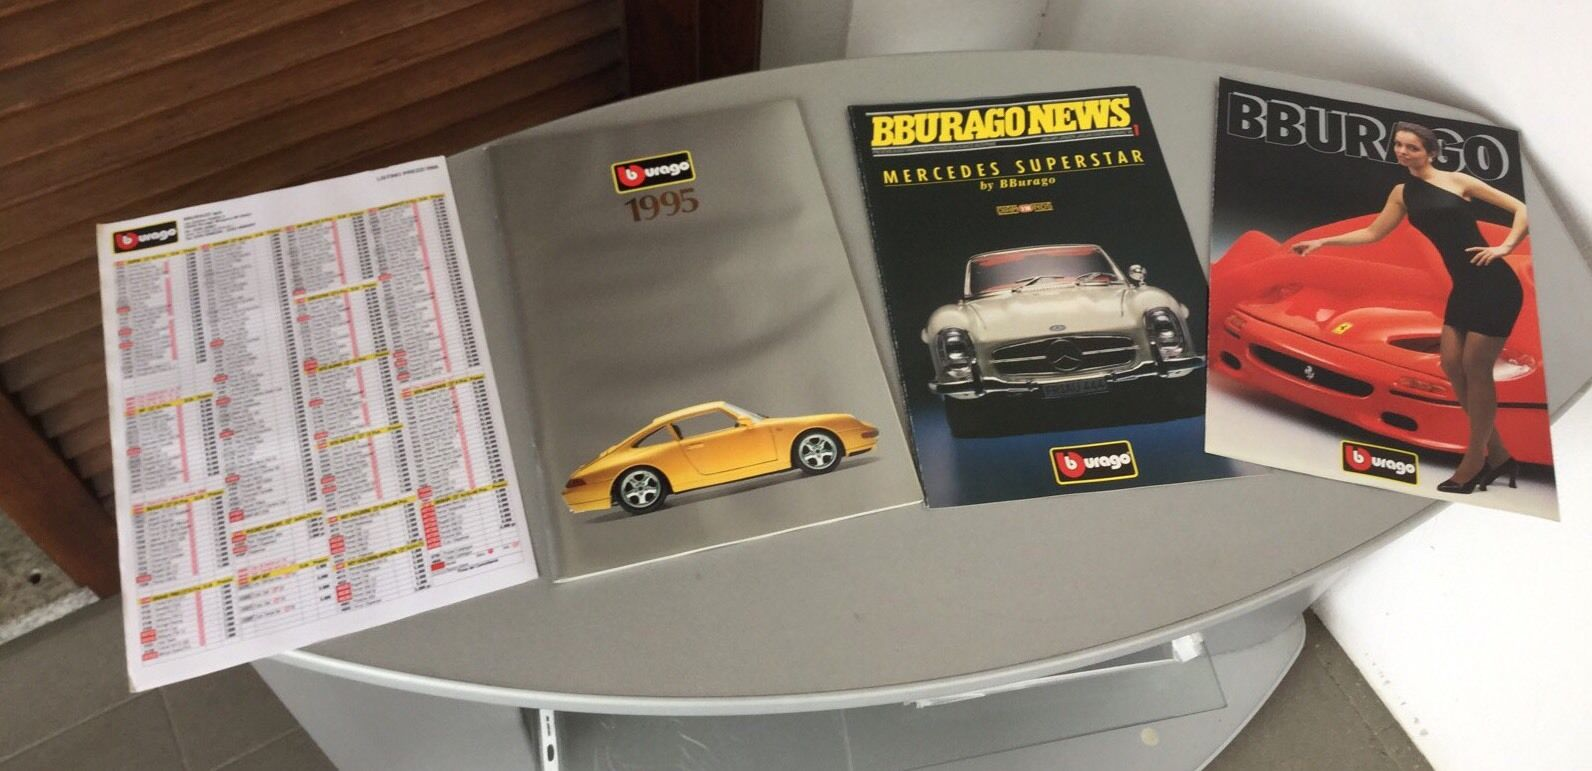 VINTAGE BURAGO BBURAGO CATALOGO CATALOGUE 1995+ UPDATE+  FERRARI F50 Fascicolo